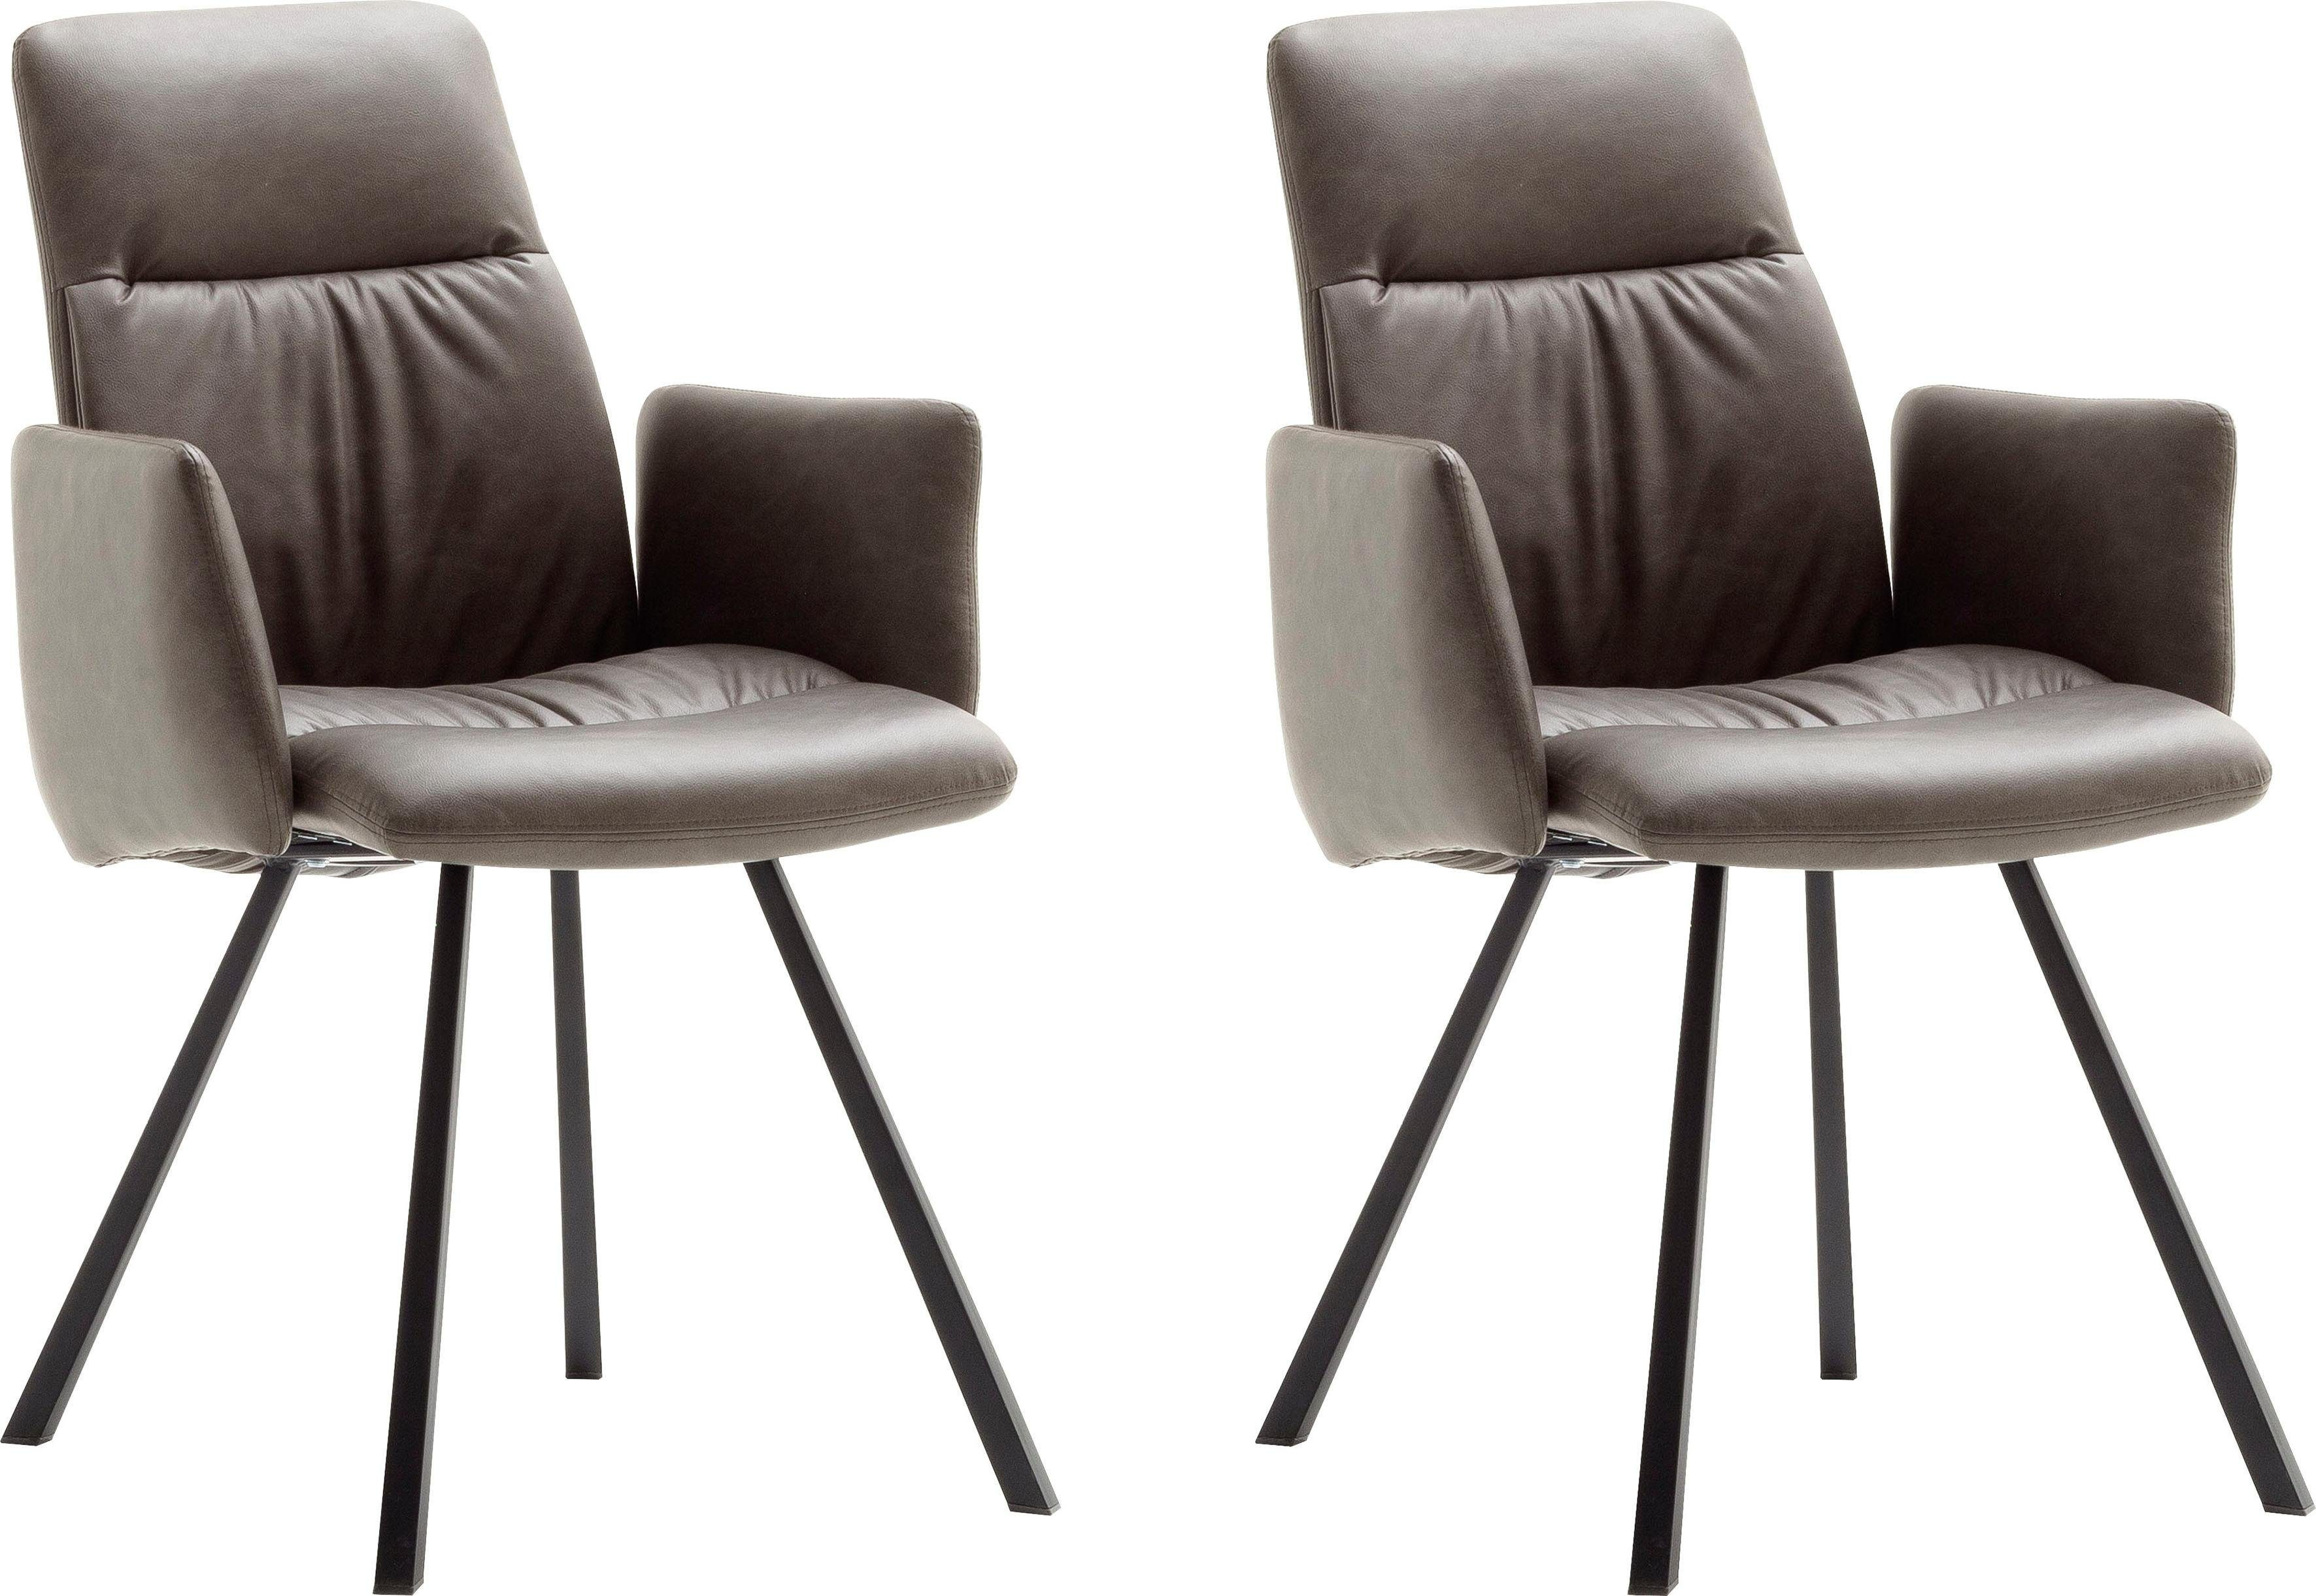 MCA furniture 4 Fußstuhl »Oxford« 2er Set, Stuhl belastbar bis 120 Kg online kaufen   OTTO